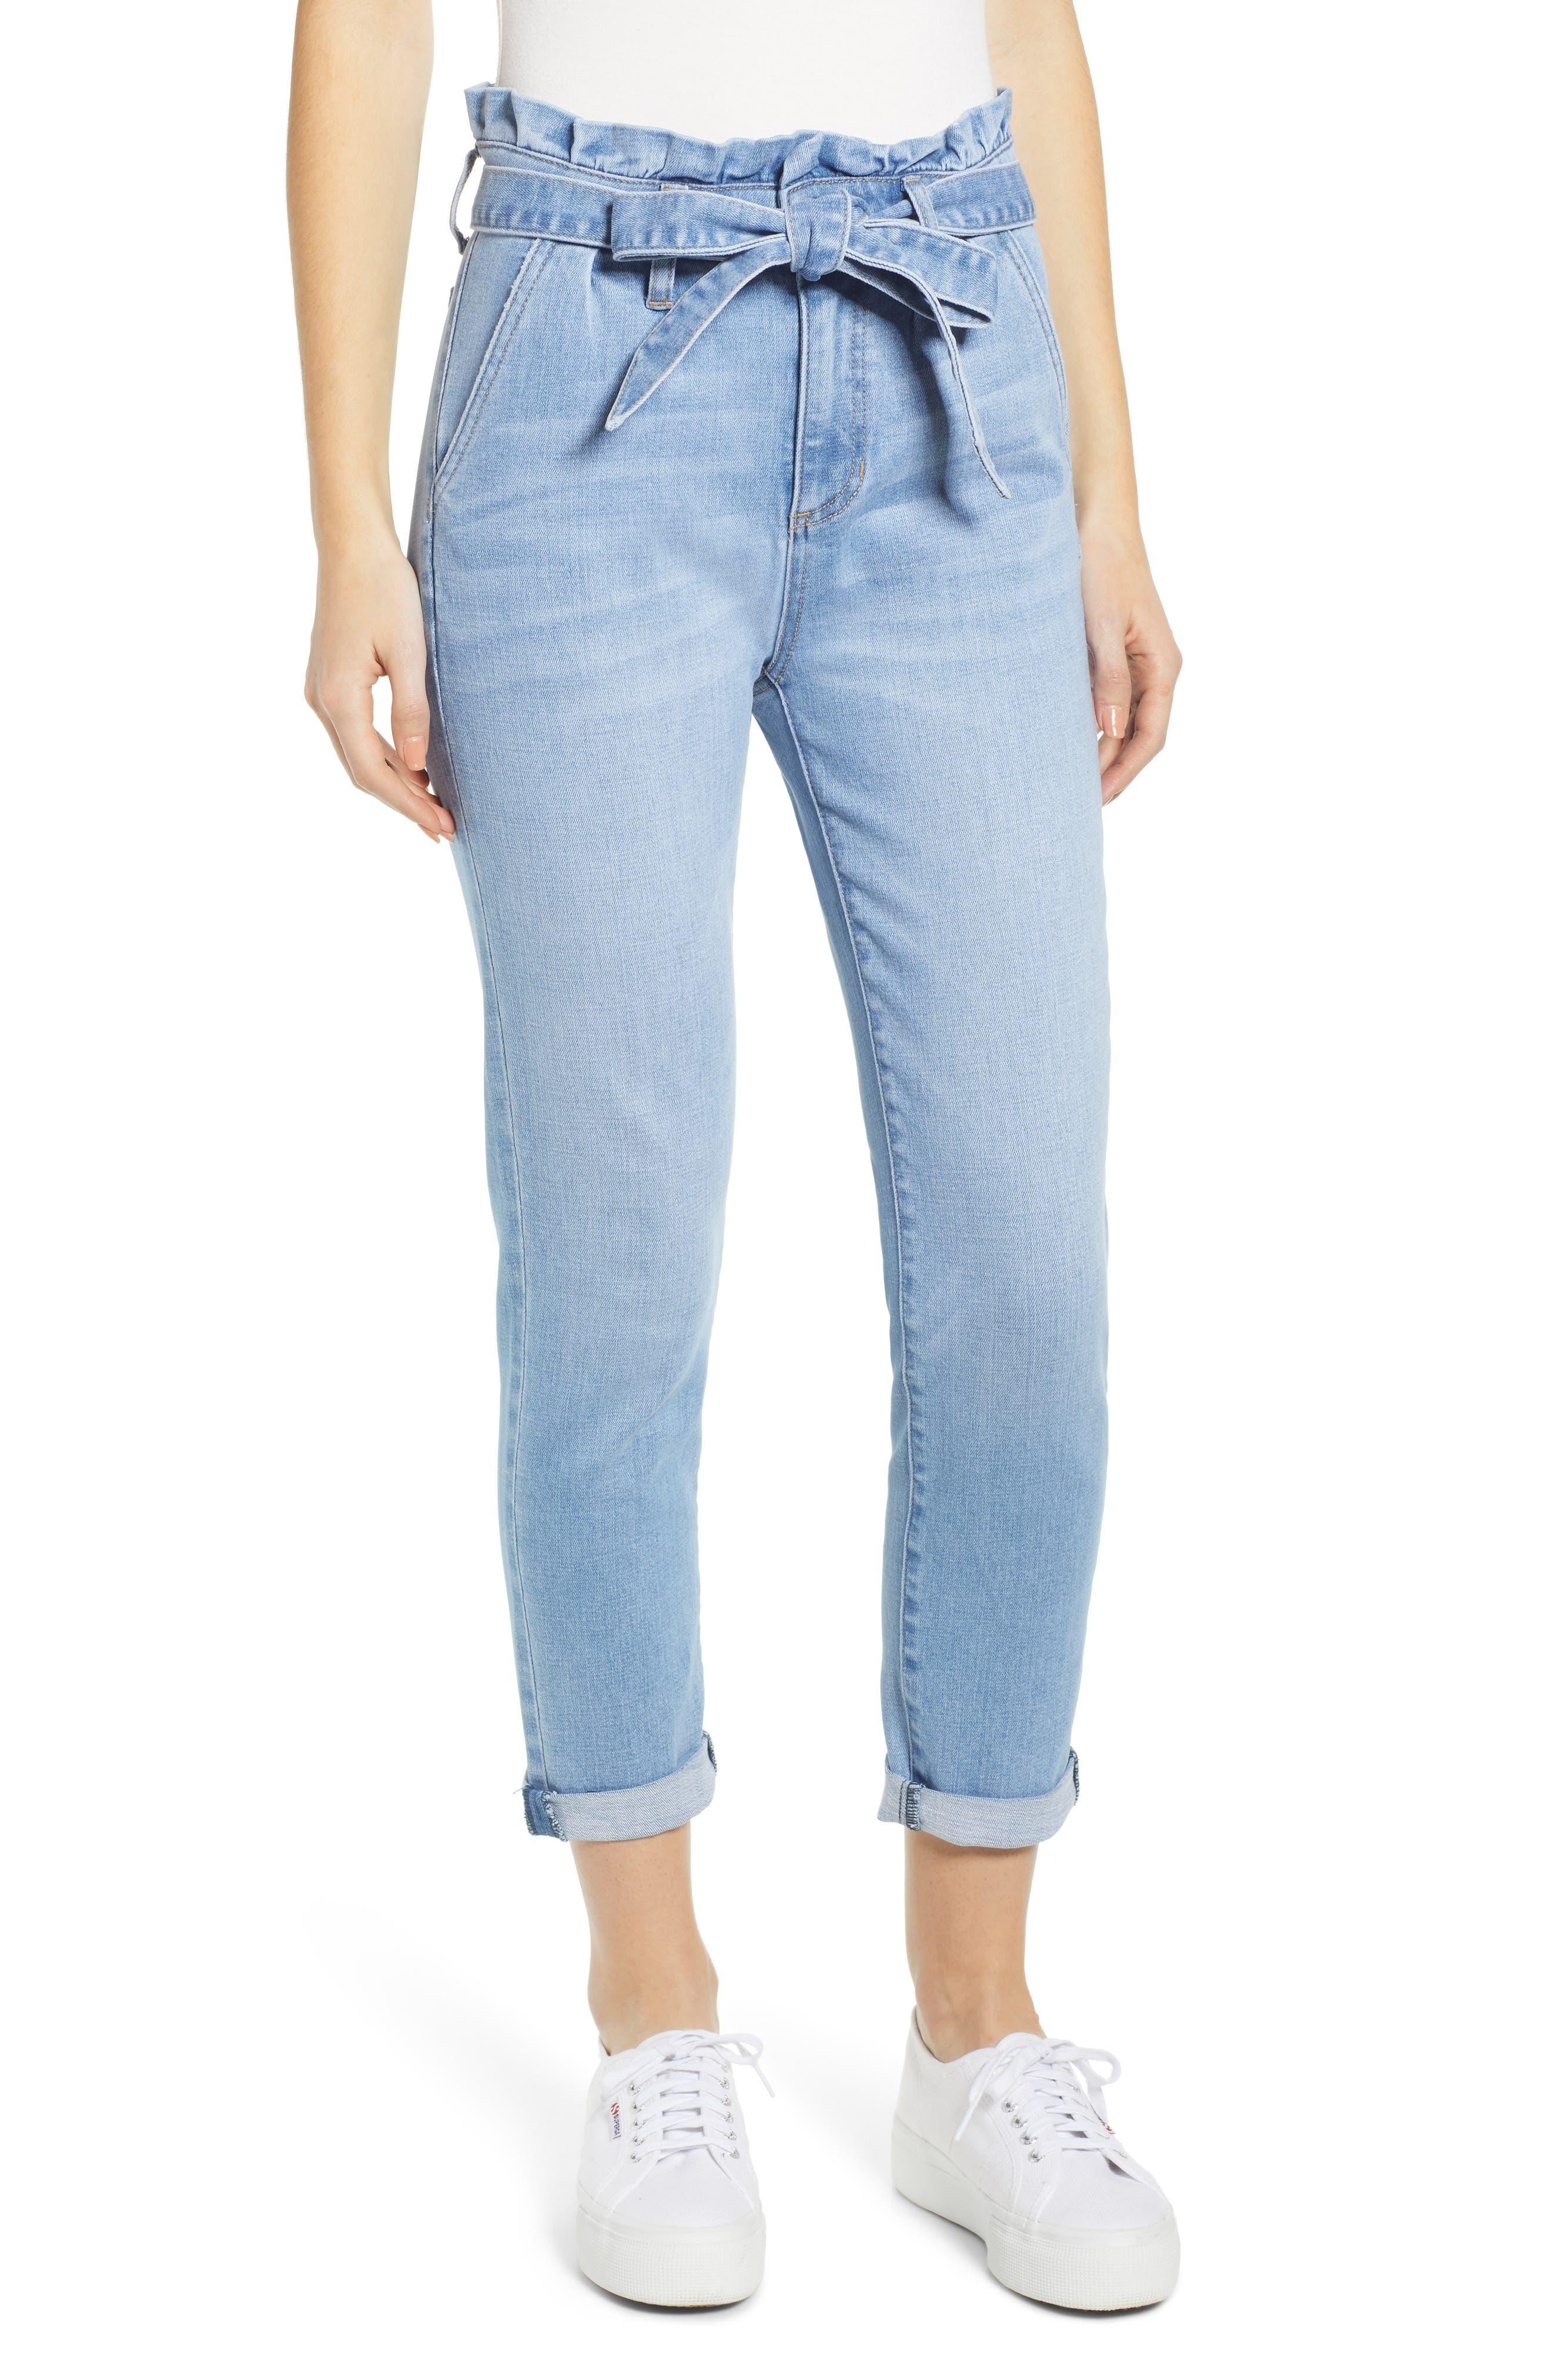 PROSPERITY DENIM Paperbag Waist Skinny Jeans, Main, color, MEDIUM WASH